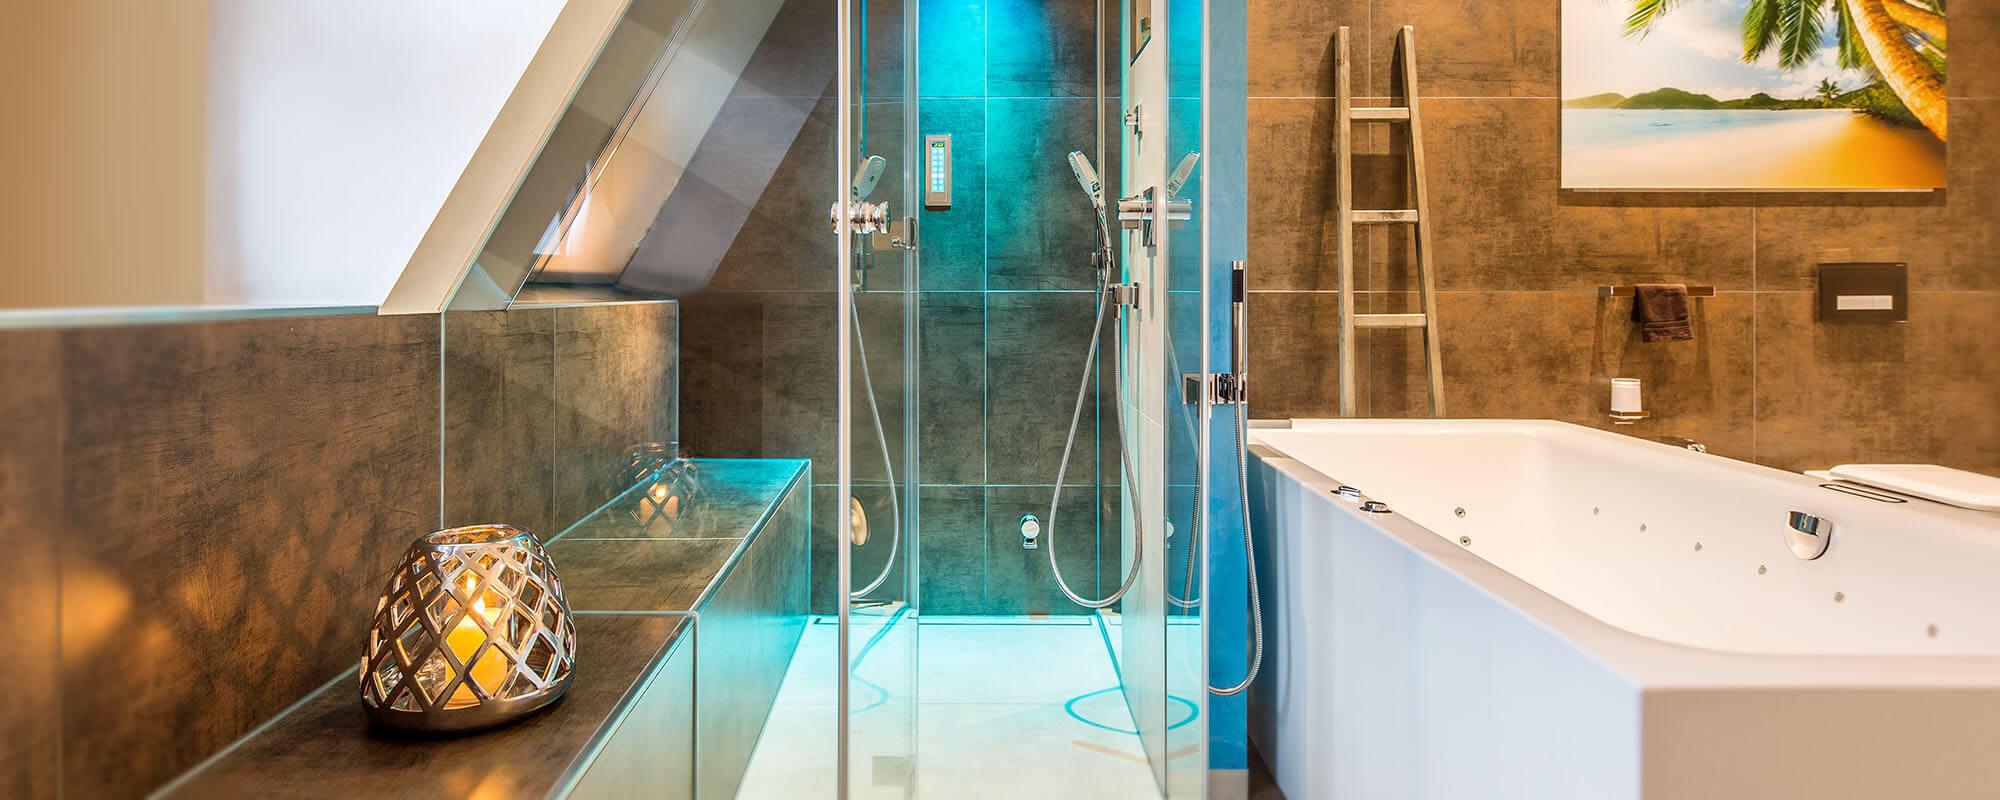 Christel GmbH Badsanierung & Heizungsmodernisierung